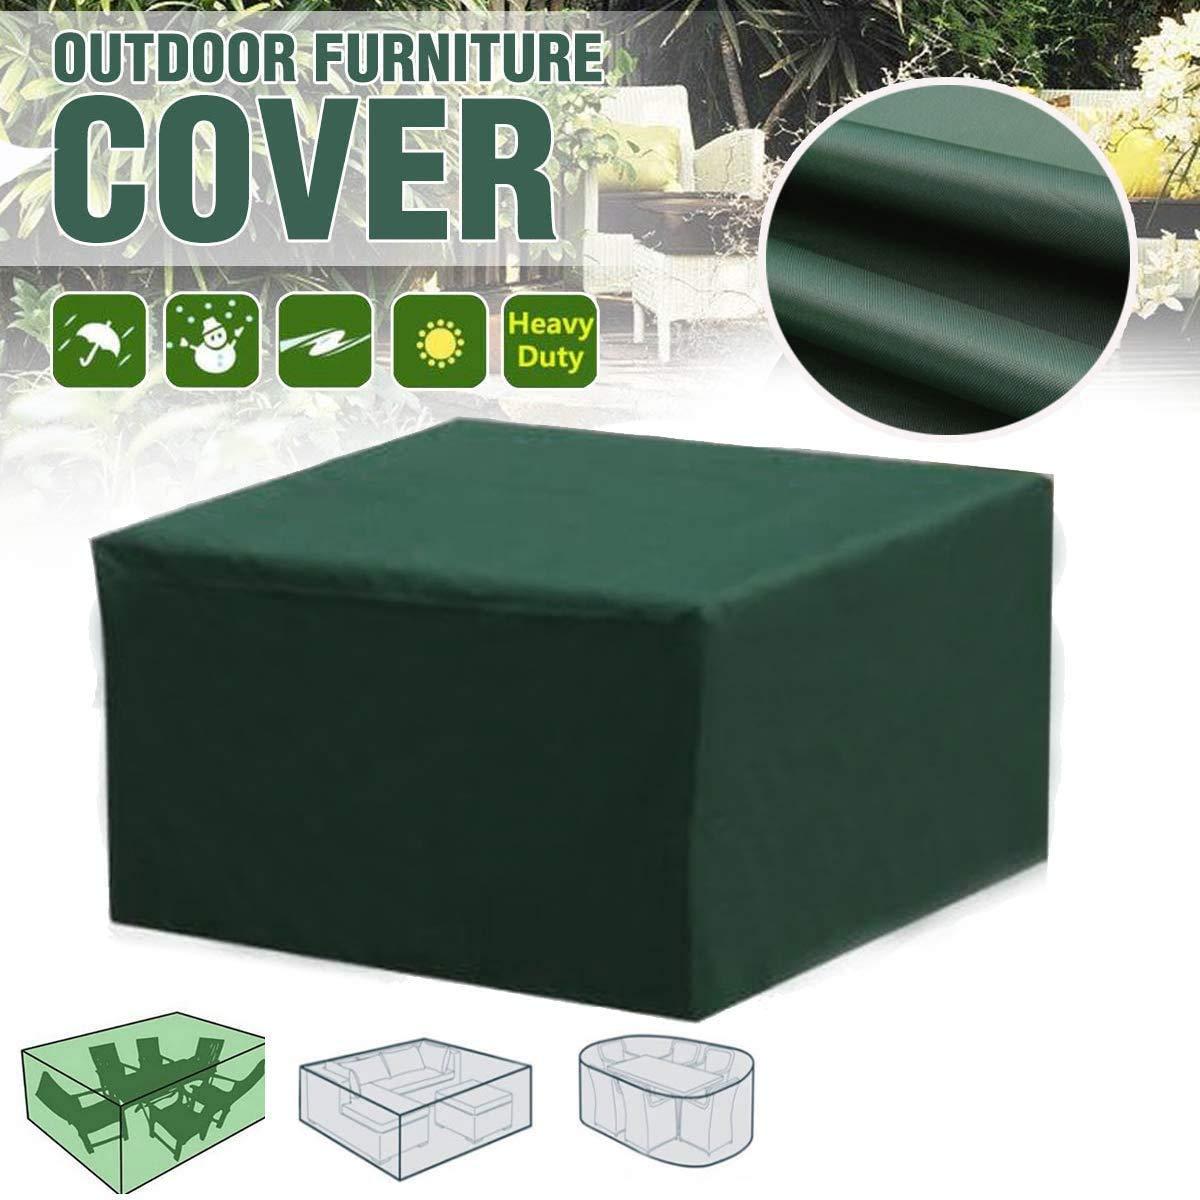 SUNDUXY Verde Funda para Muebles de Jardín,Copertura Impermeable para Mesas Rectangular,Cubierta de Exterior Funda Protectora Muebles Mesas Sillas Sofás Exterior Oxford,213x132x70cm: Amazon.es: Hogar